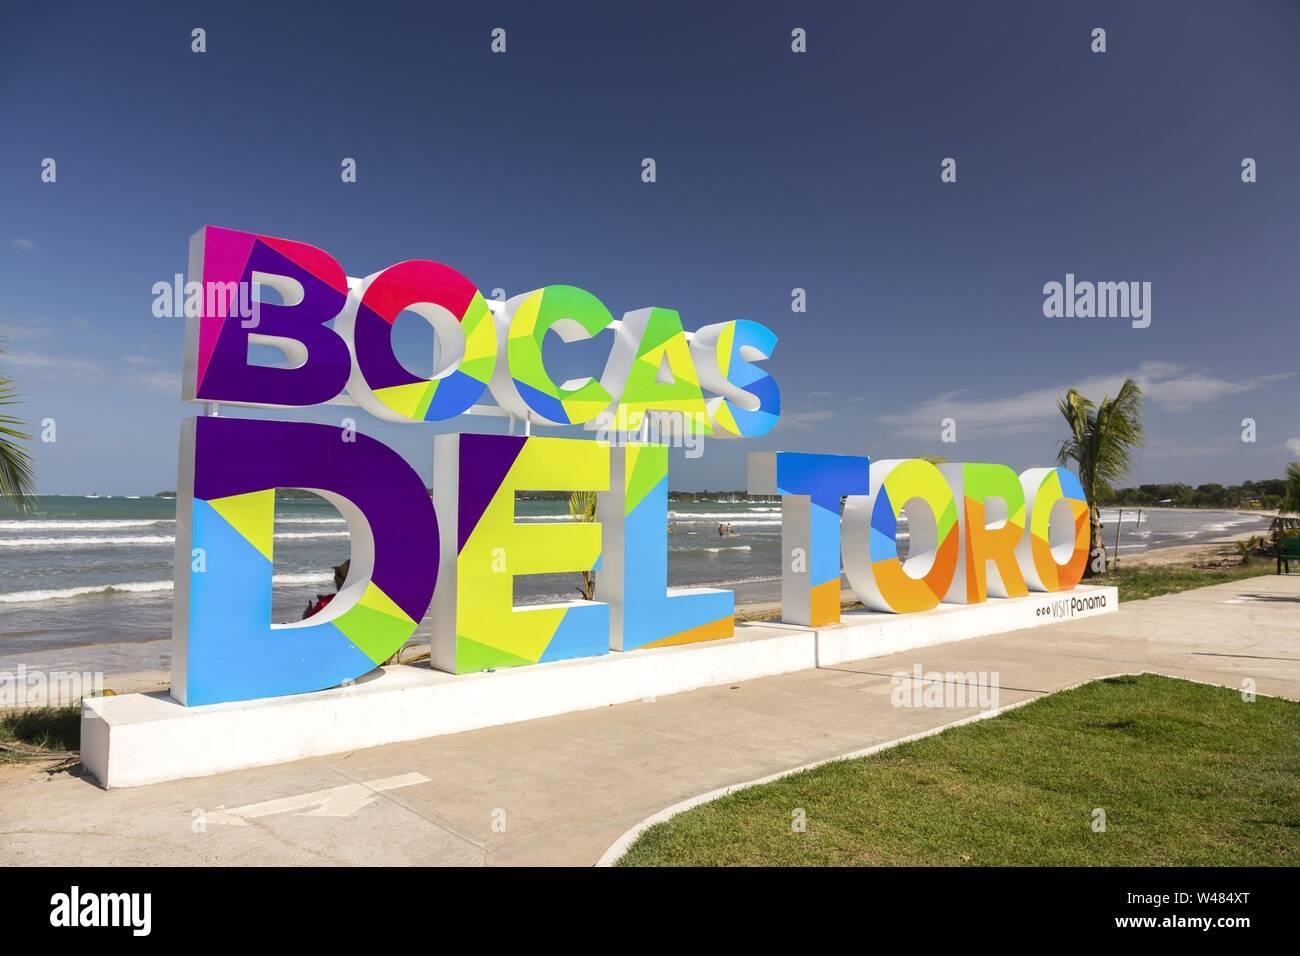 Colorful Large Block Letter Sign at Caribbean Sea Waterfront. Bocas Del Toro Archipelago is the most famous Panama tourist destination Stock Photo